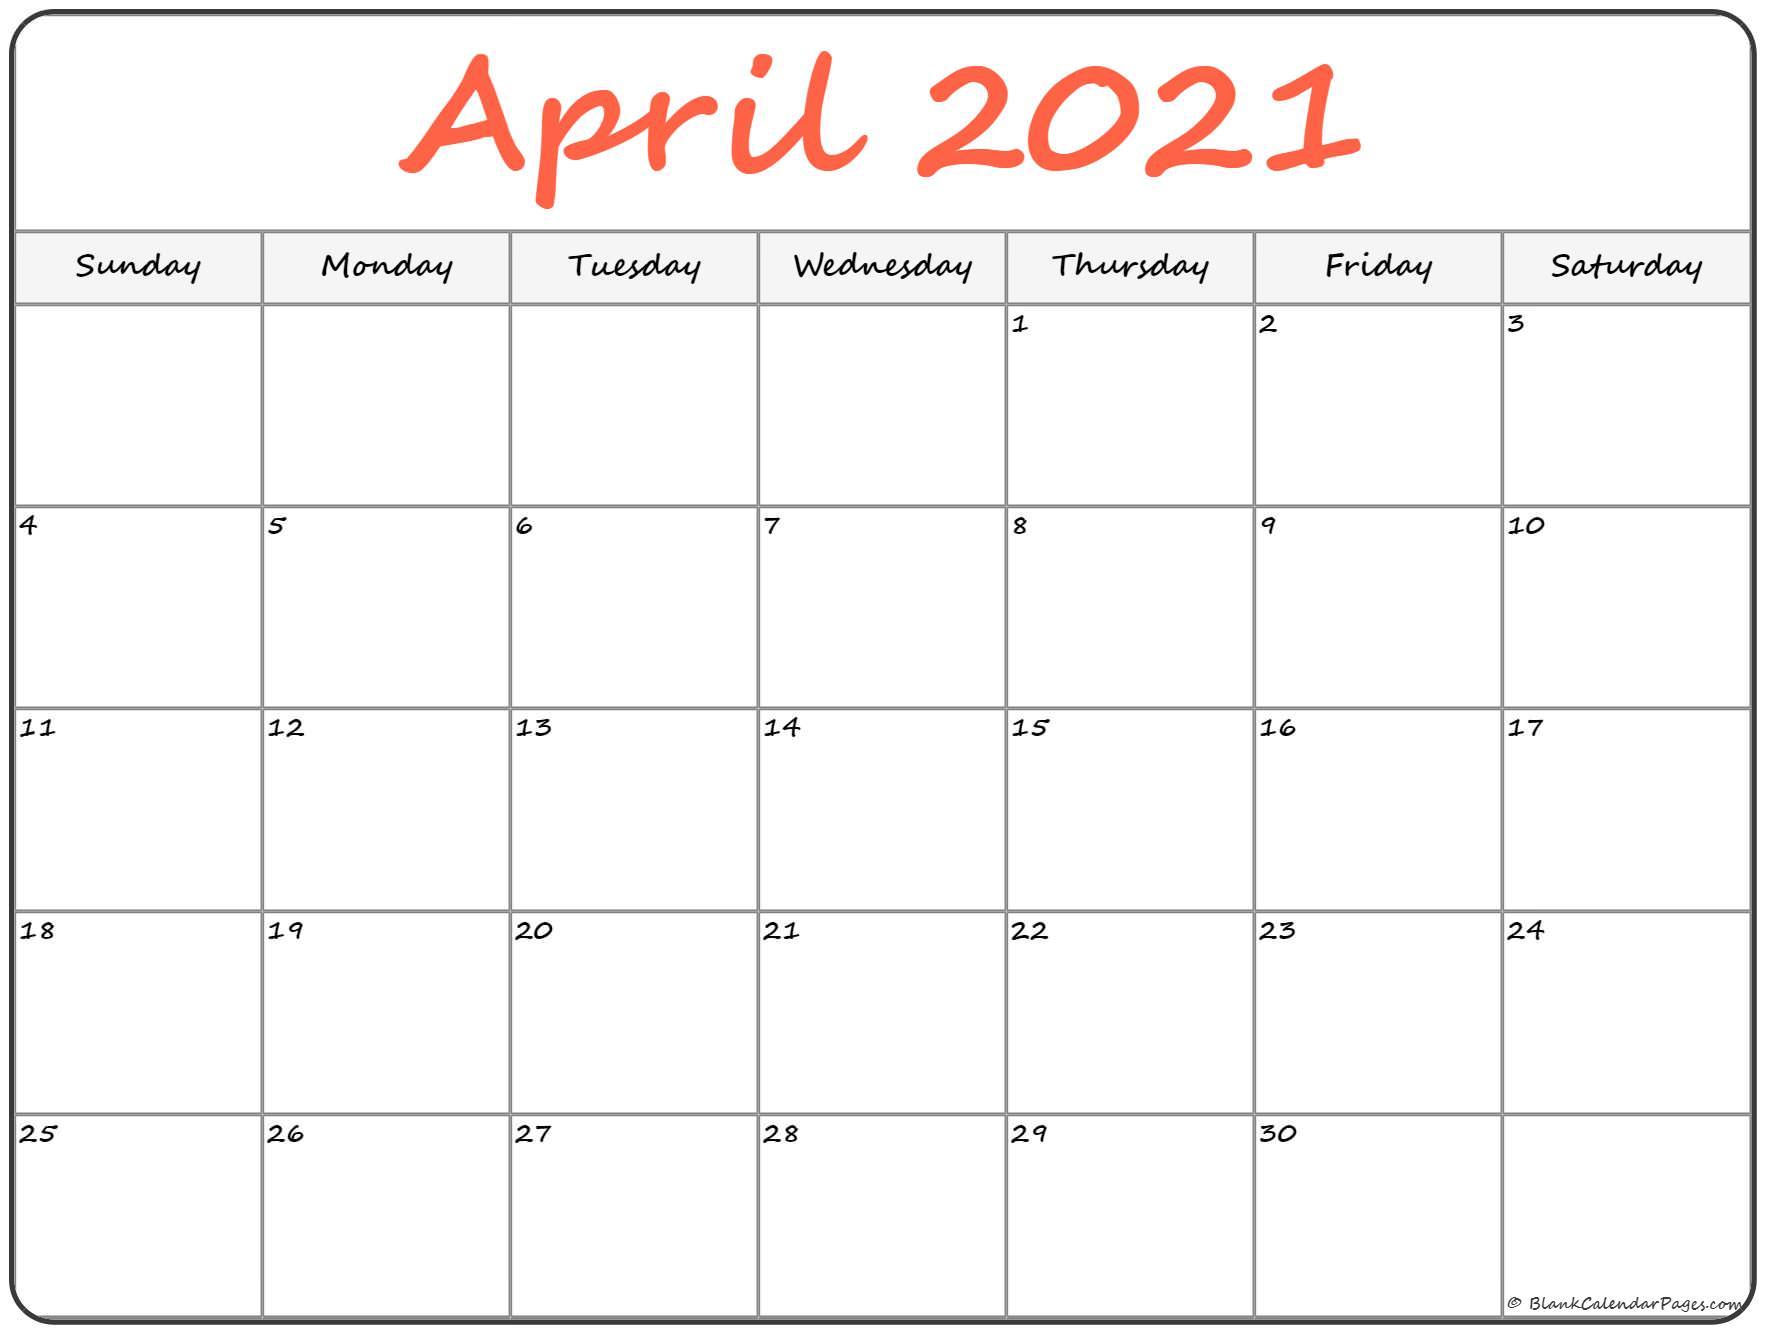 April 2021 Calendar PDF